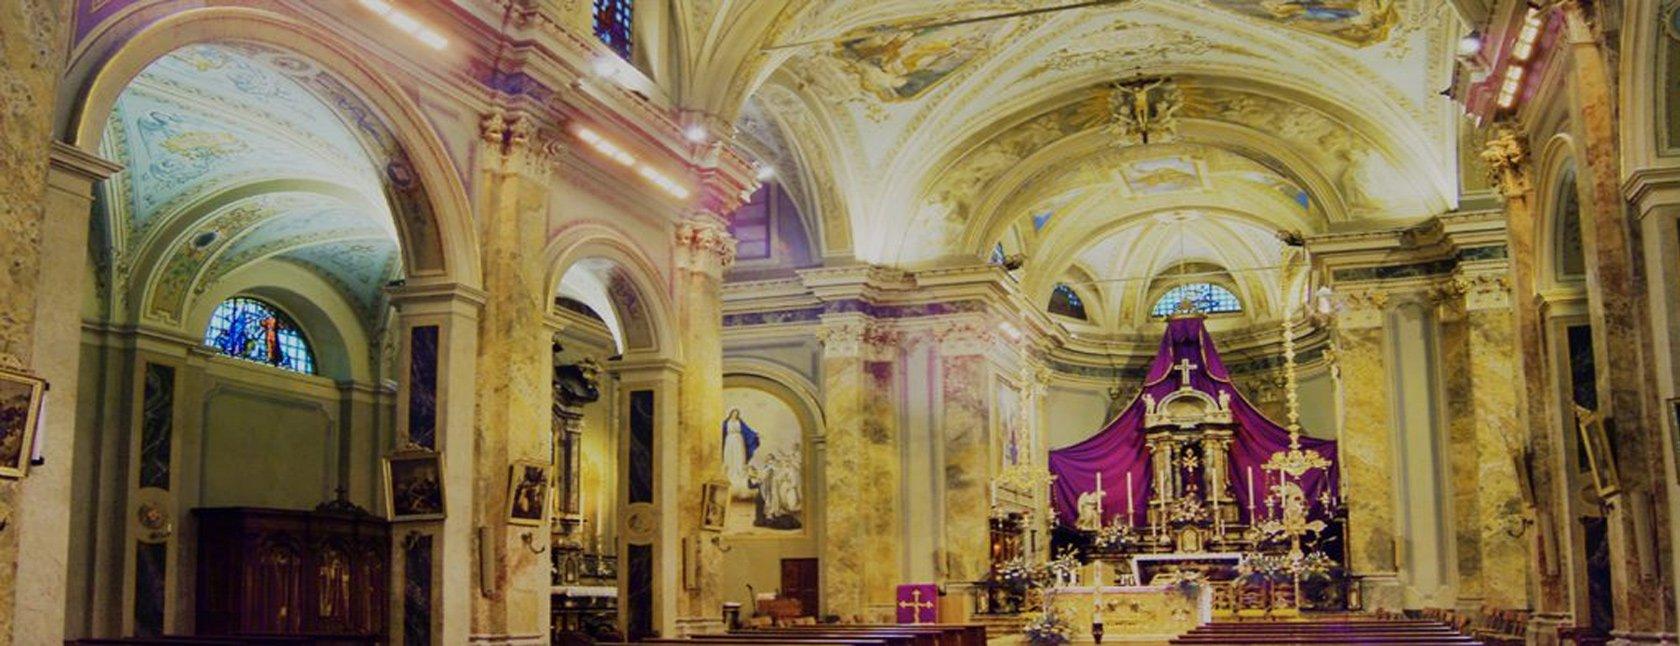 calefaccion-infrarrojos-slider-ppal-iglesias